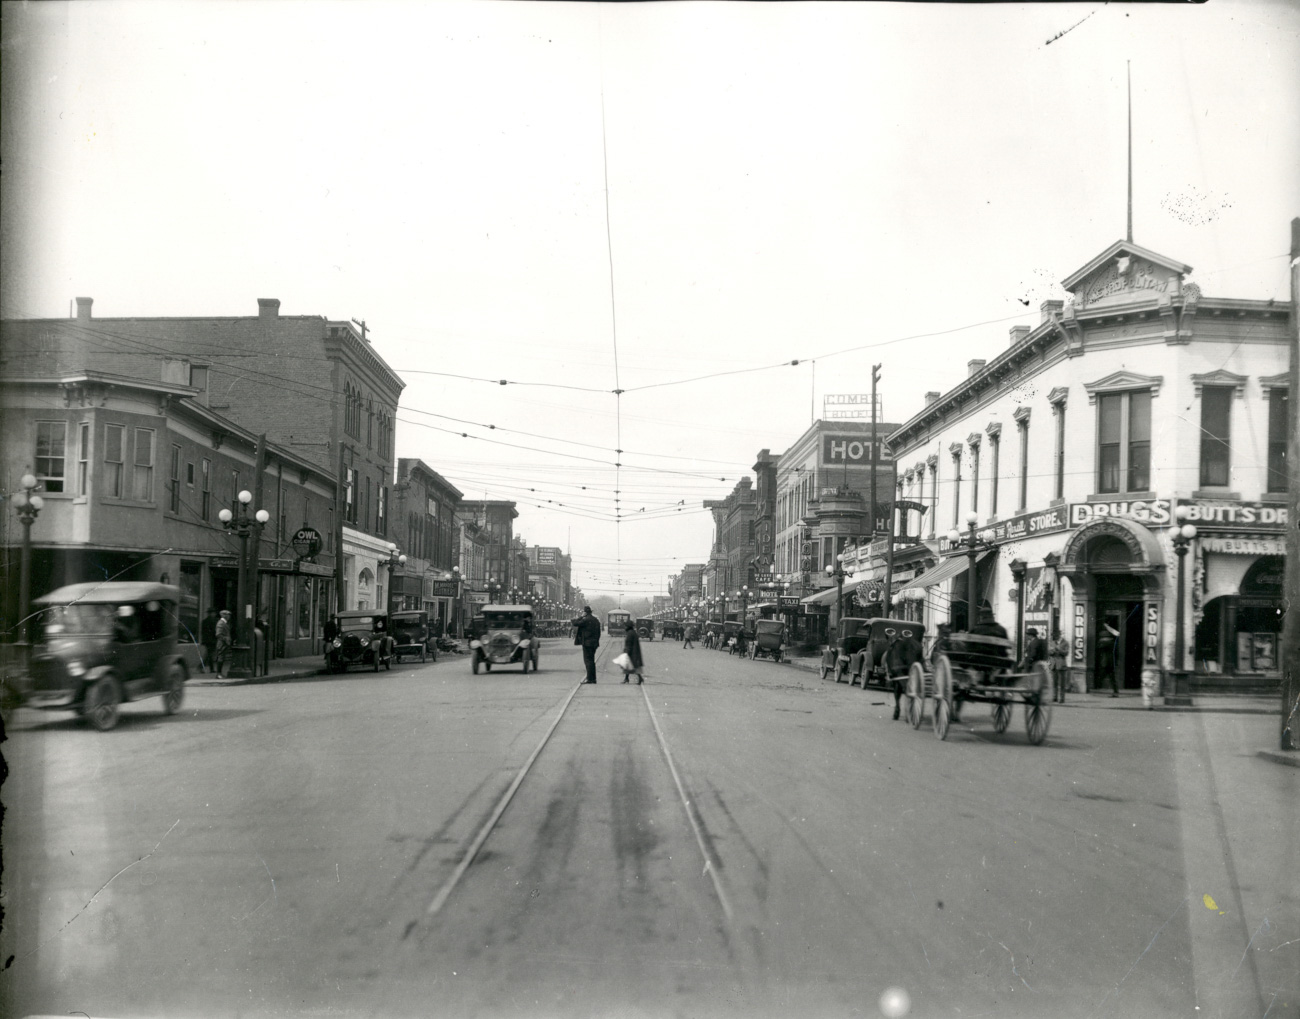 Building a Community: Albuquerque 1920s